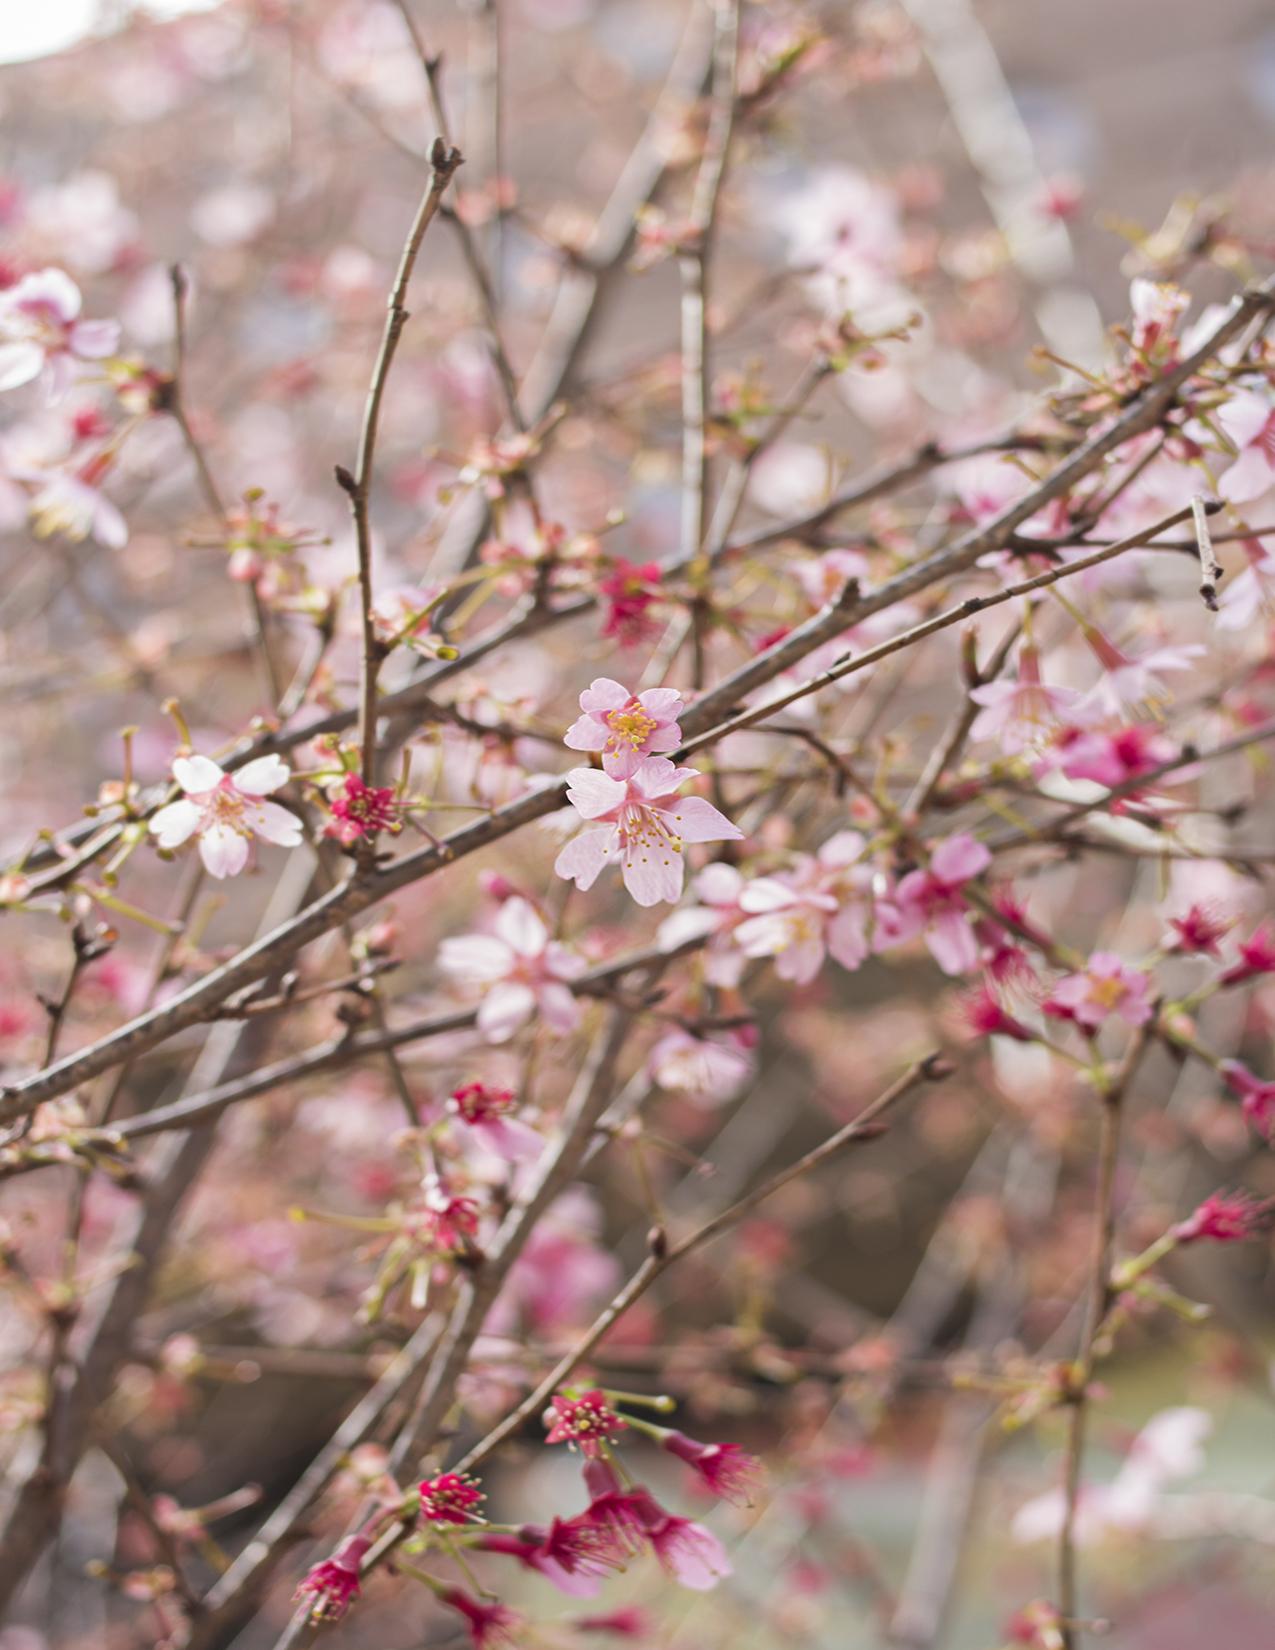 Eileen_Ko_Assignment_4_Pink_Dark_Pink_Flowers_Branches